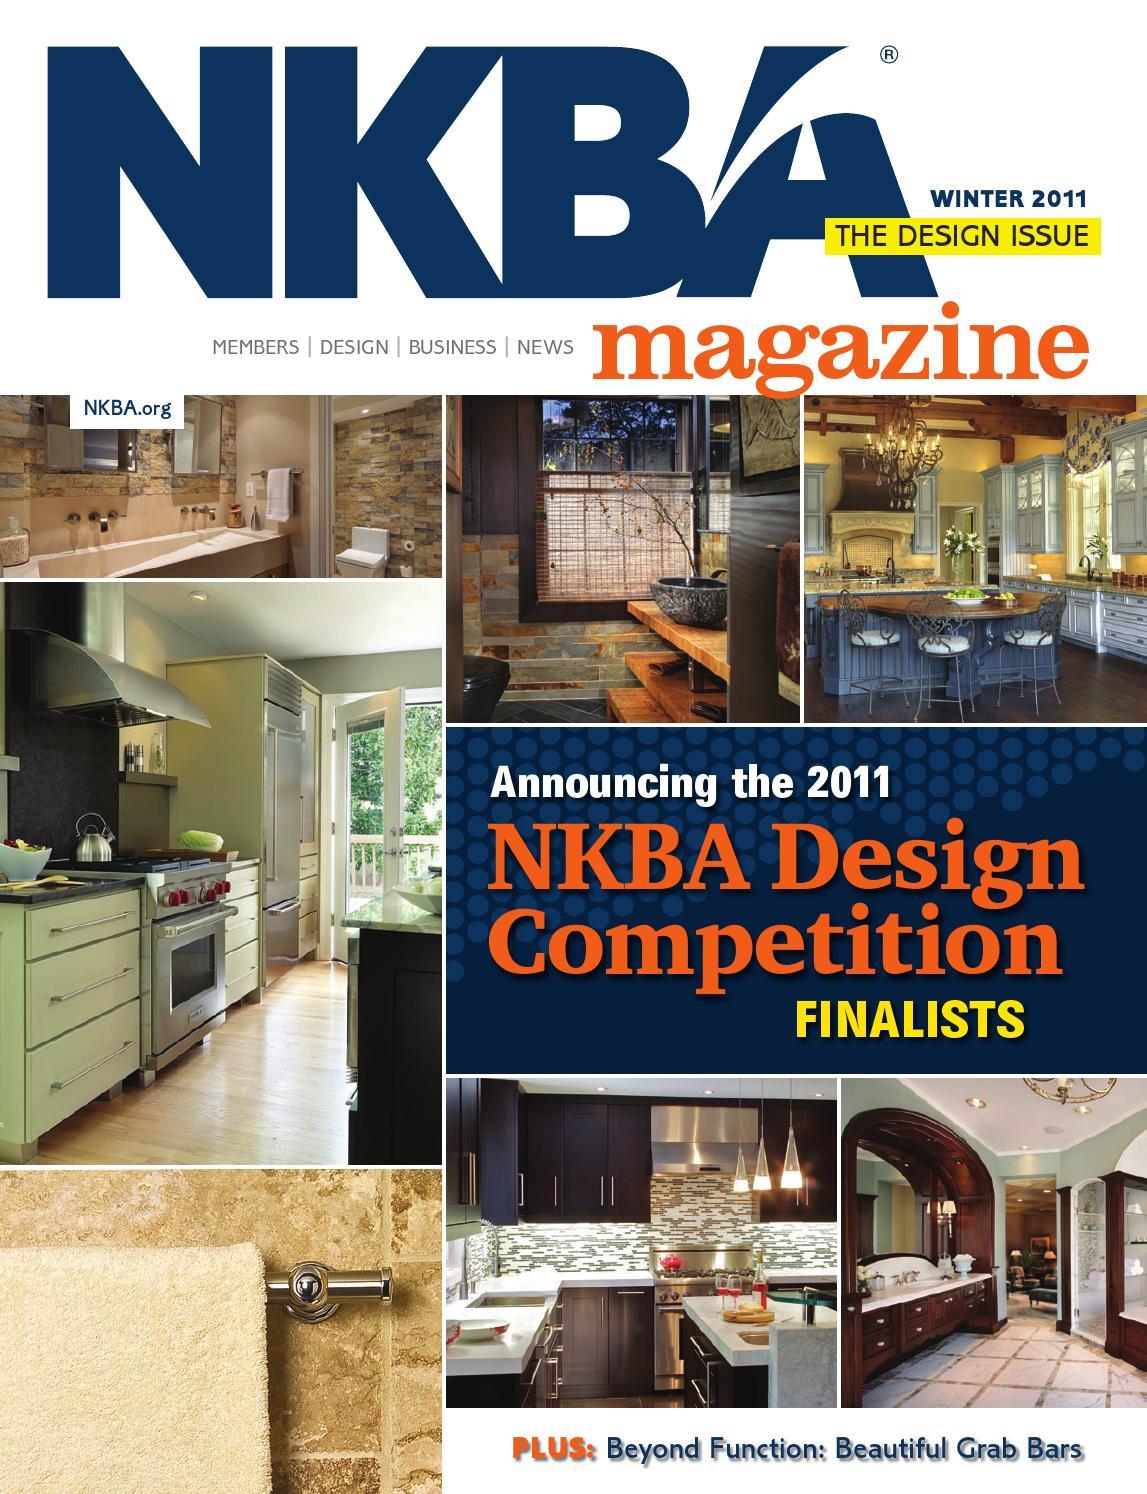 Issuu Nkba Magazine Winter 2011 By National Kitchen Bath Association Nkba